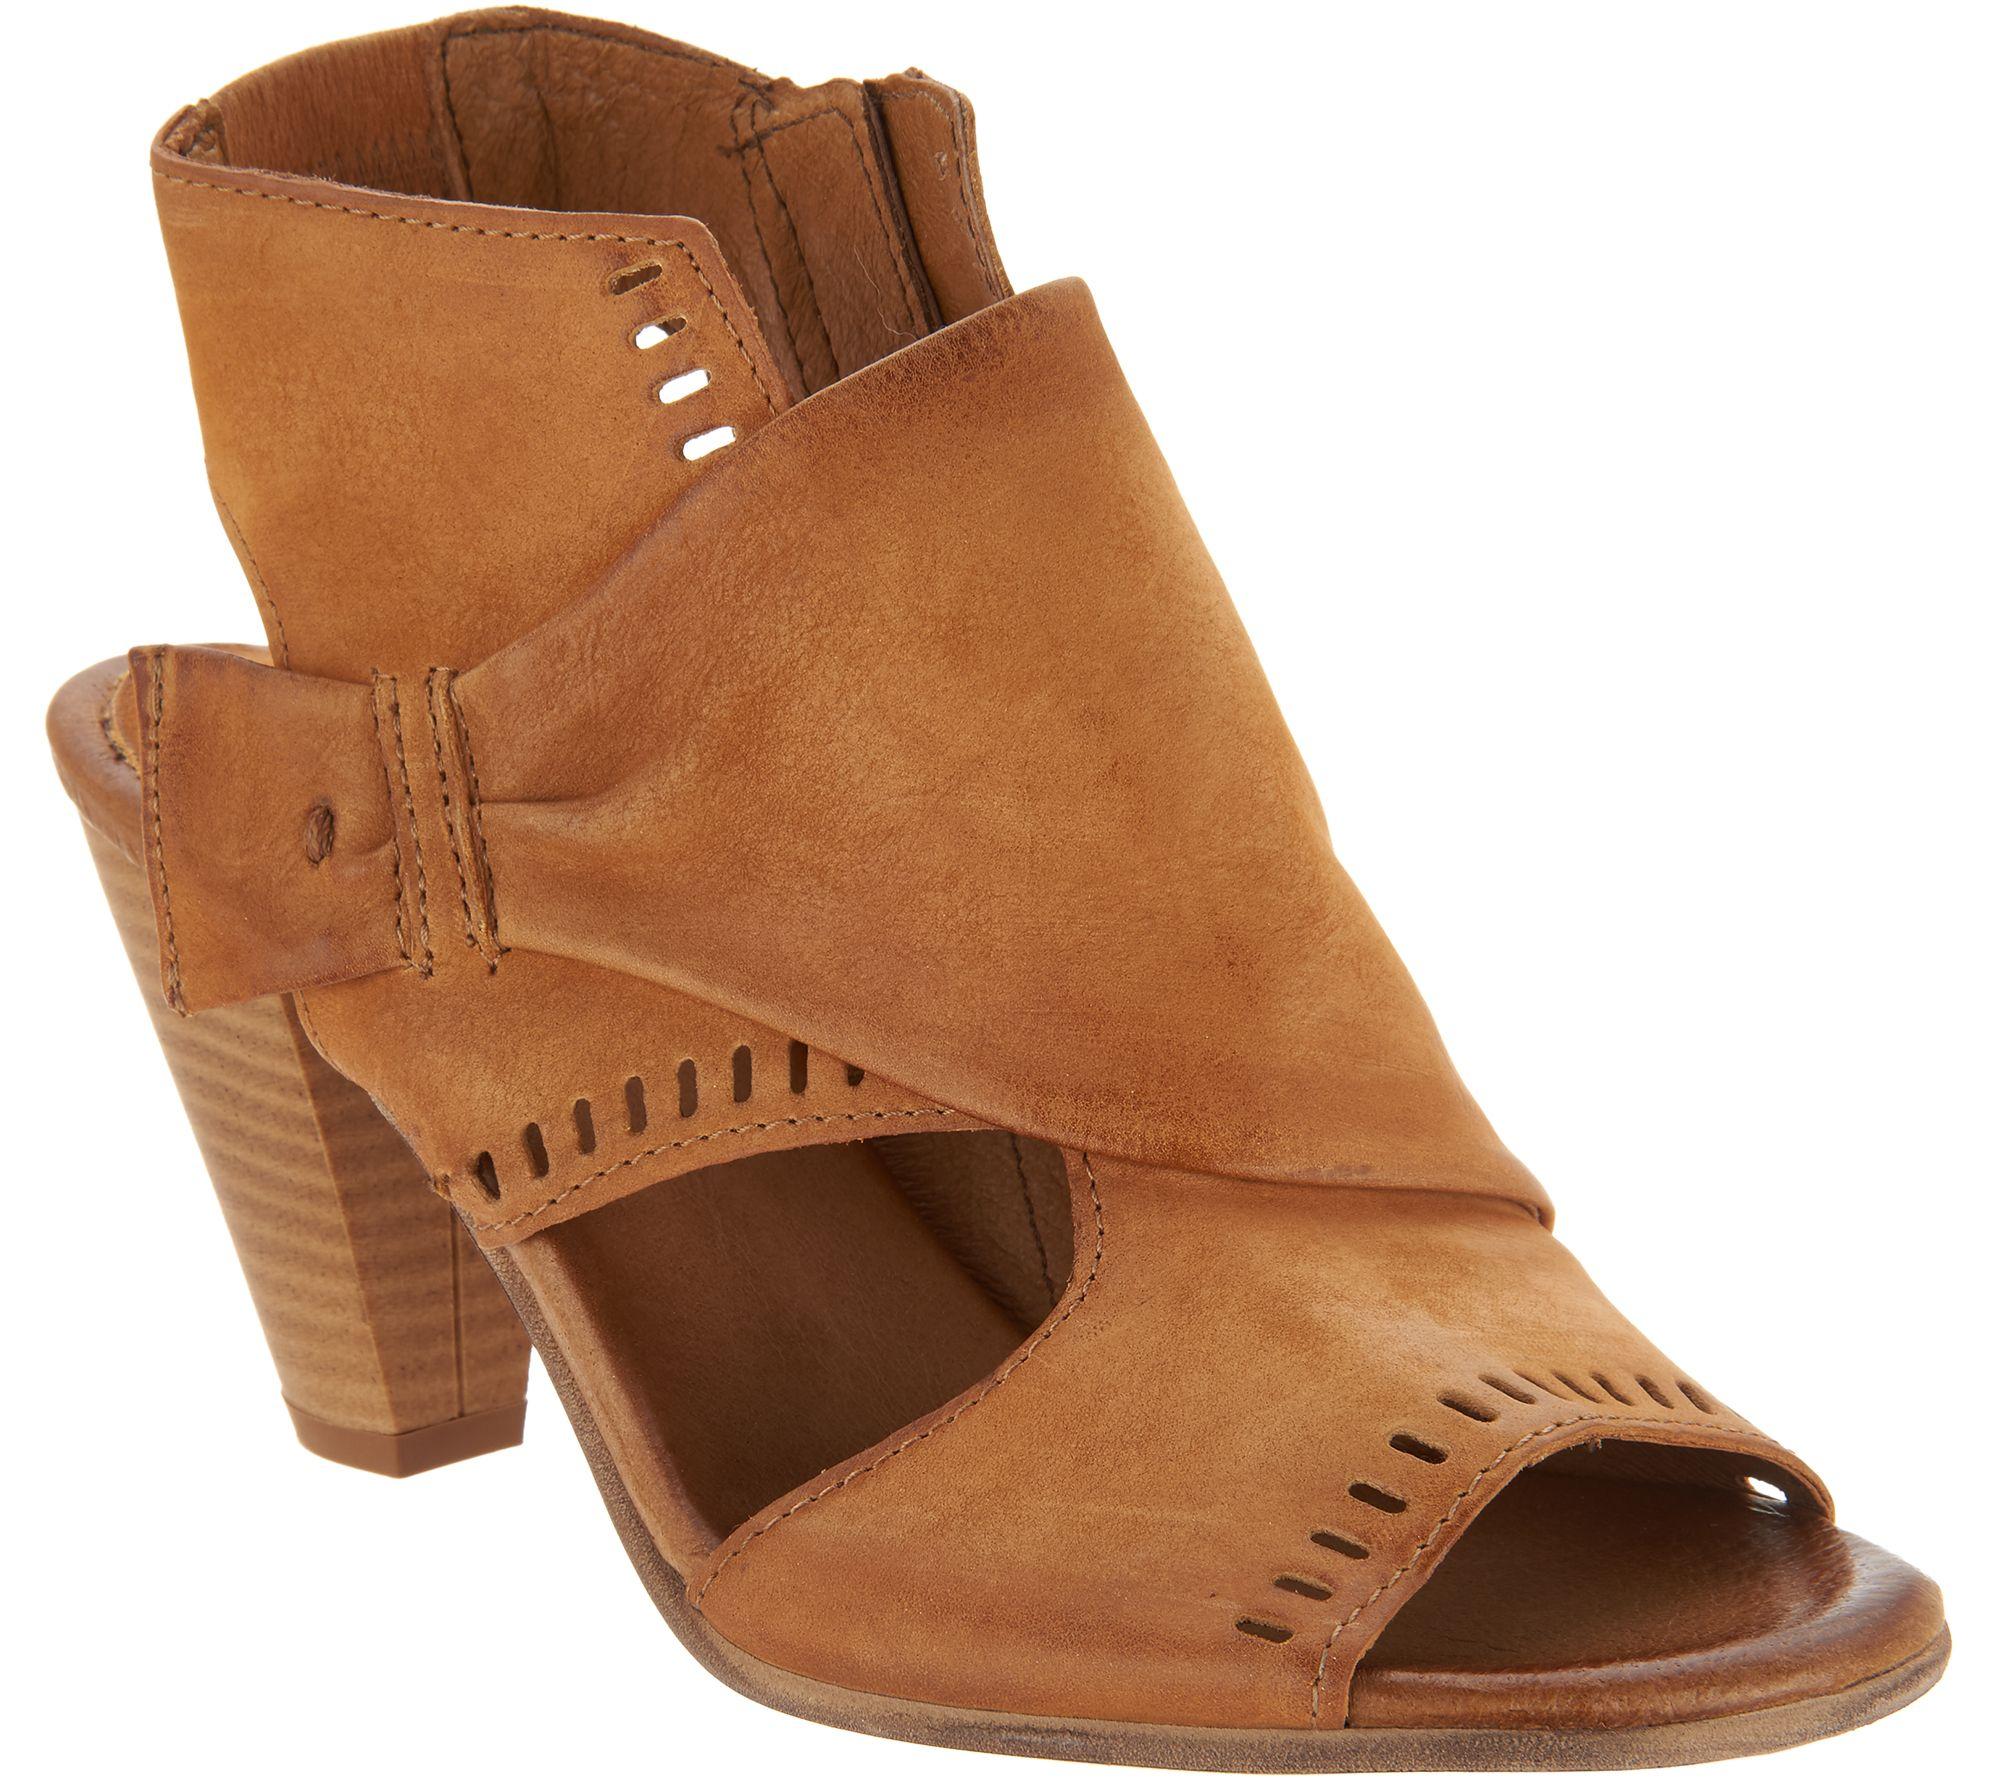 8ff77a86bd8 Miz Mooz Leather Peep-Toe Heeled Sandals - Moonlight - Page 1 — QVC.com